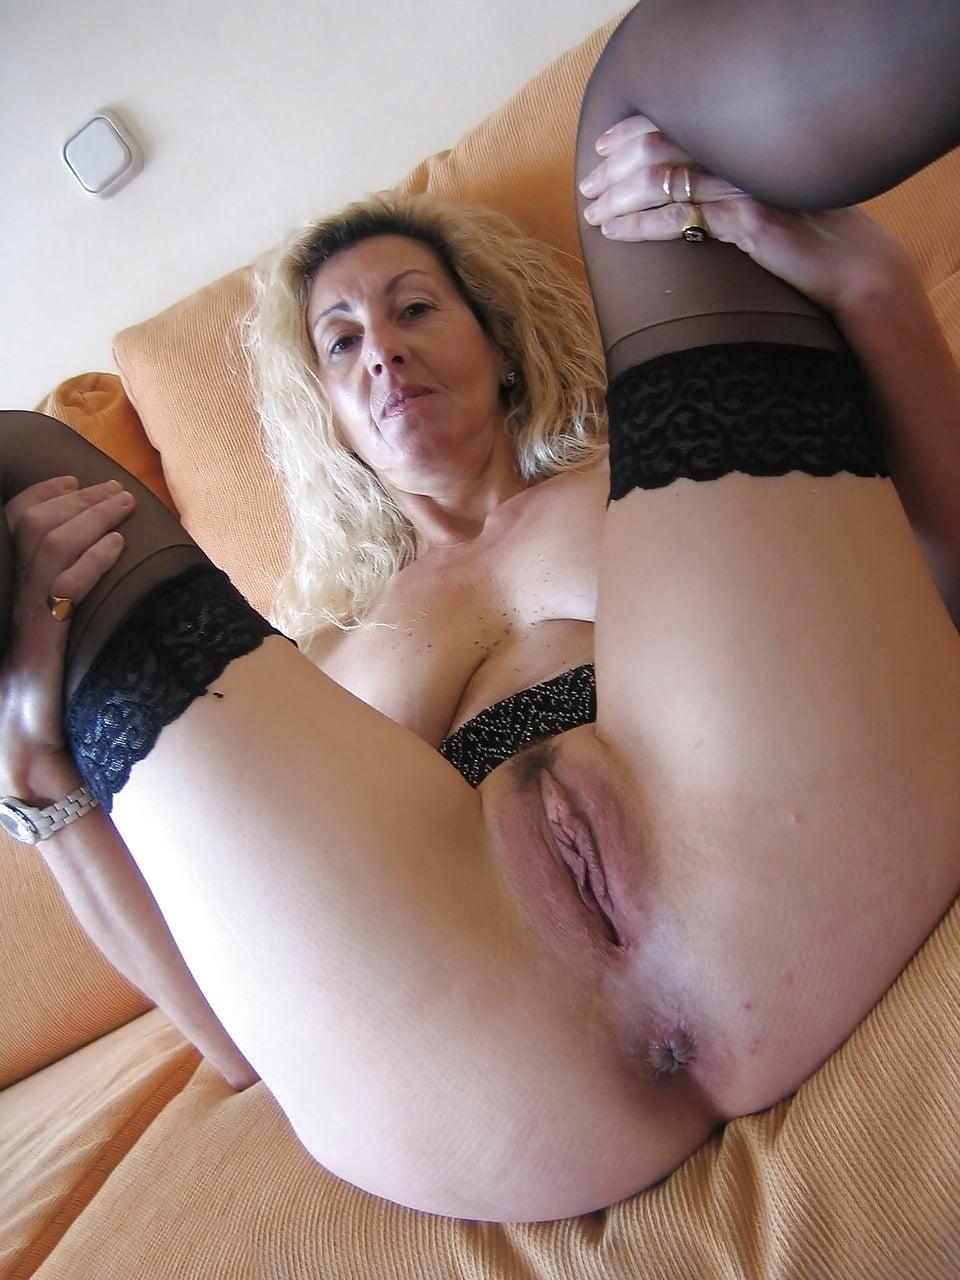 seksi-teti-krupno-rossiyskih-aktris-porno-video